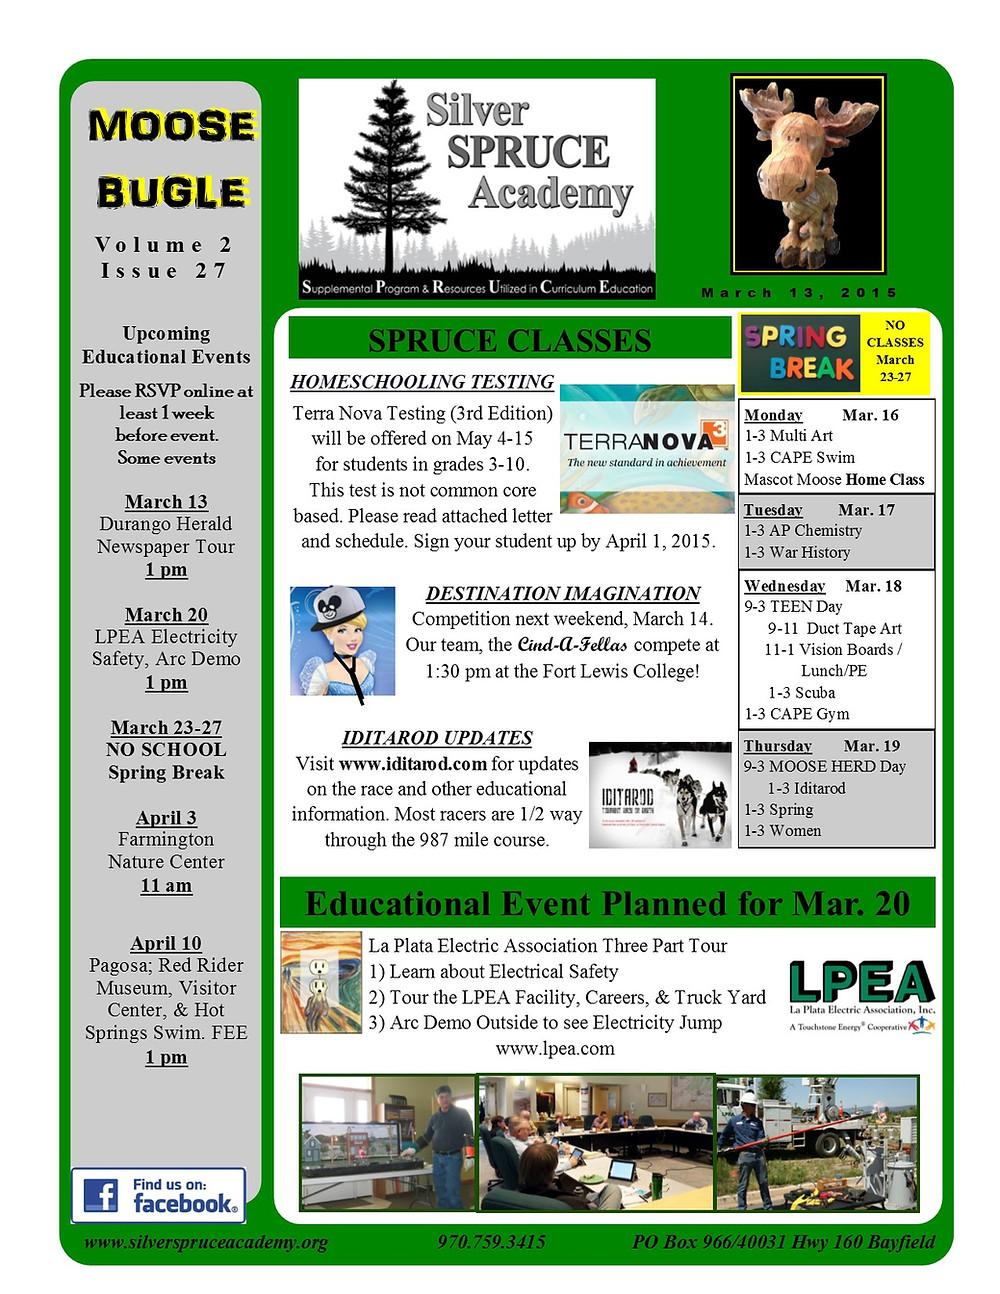 Moose Bugle 3-13-15 (Page 1).jpg